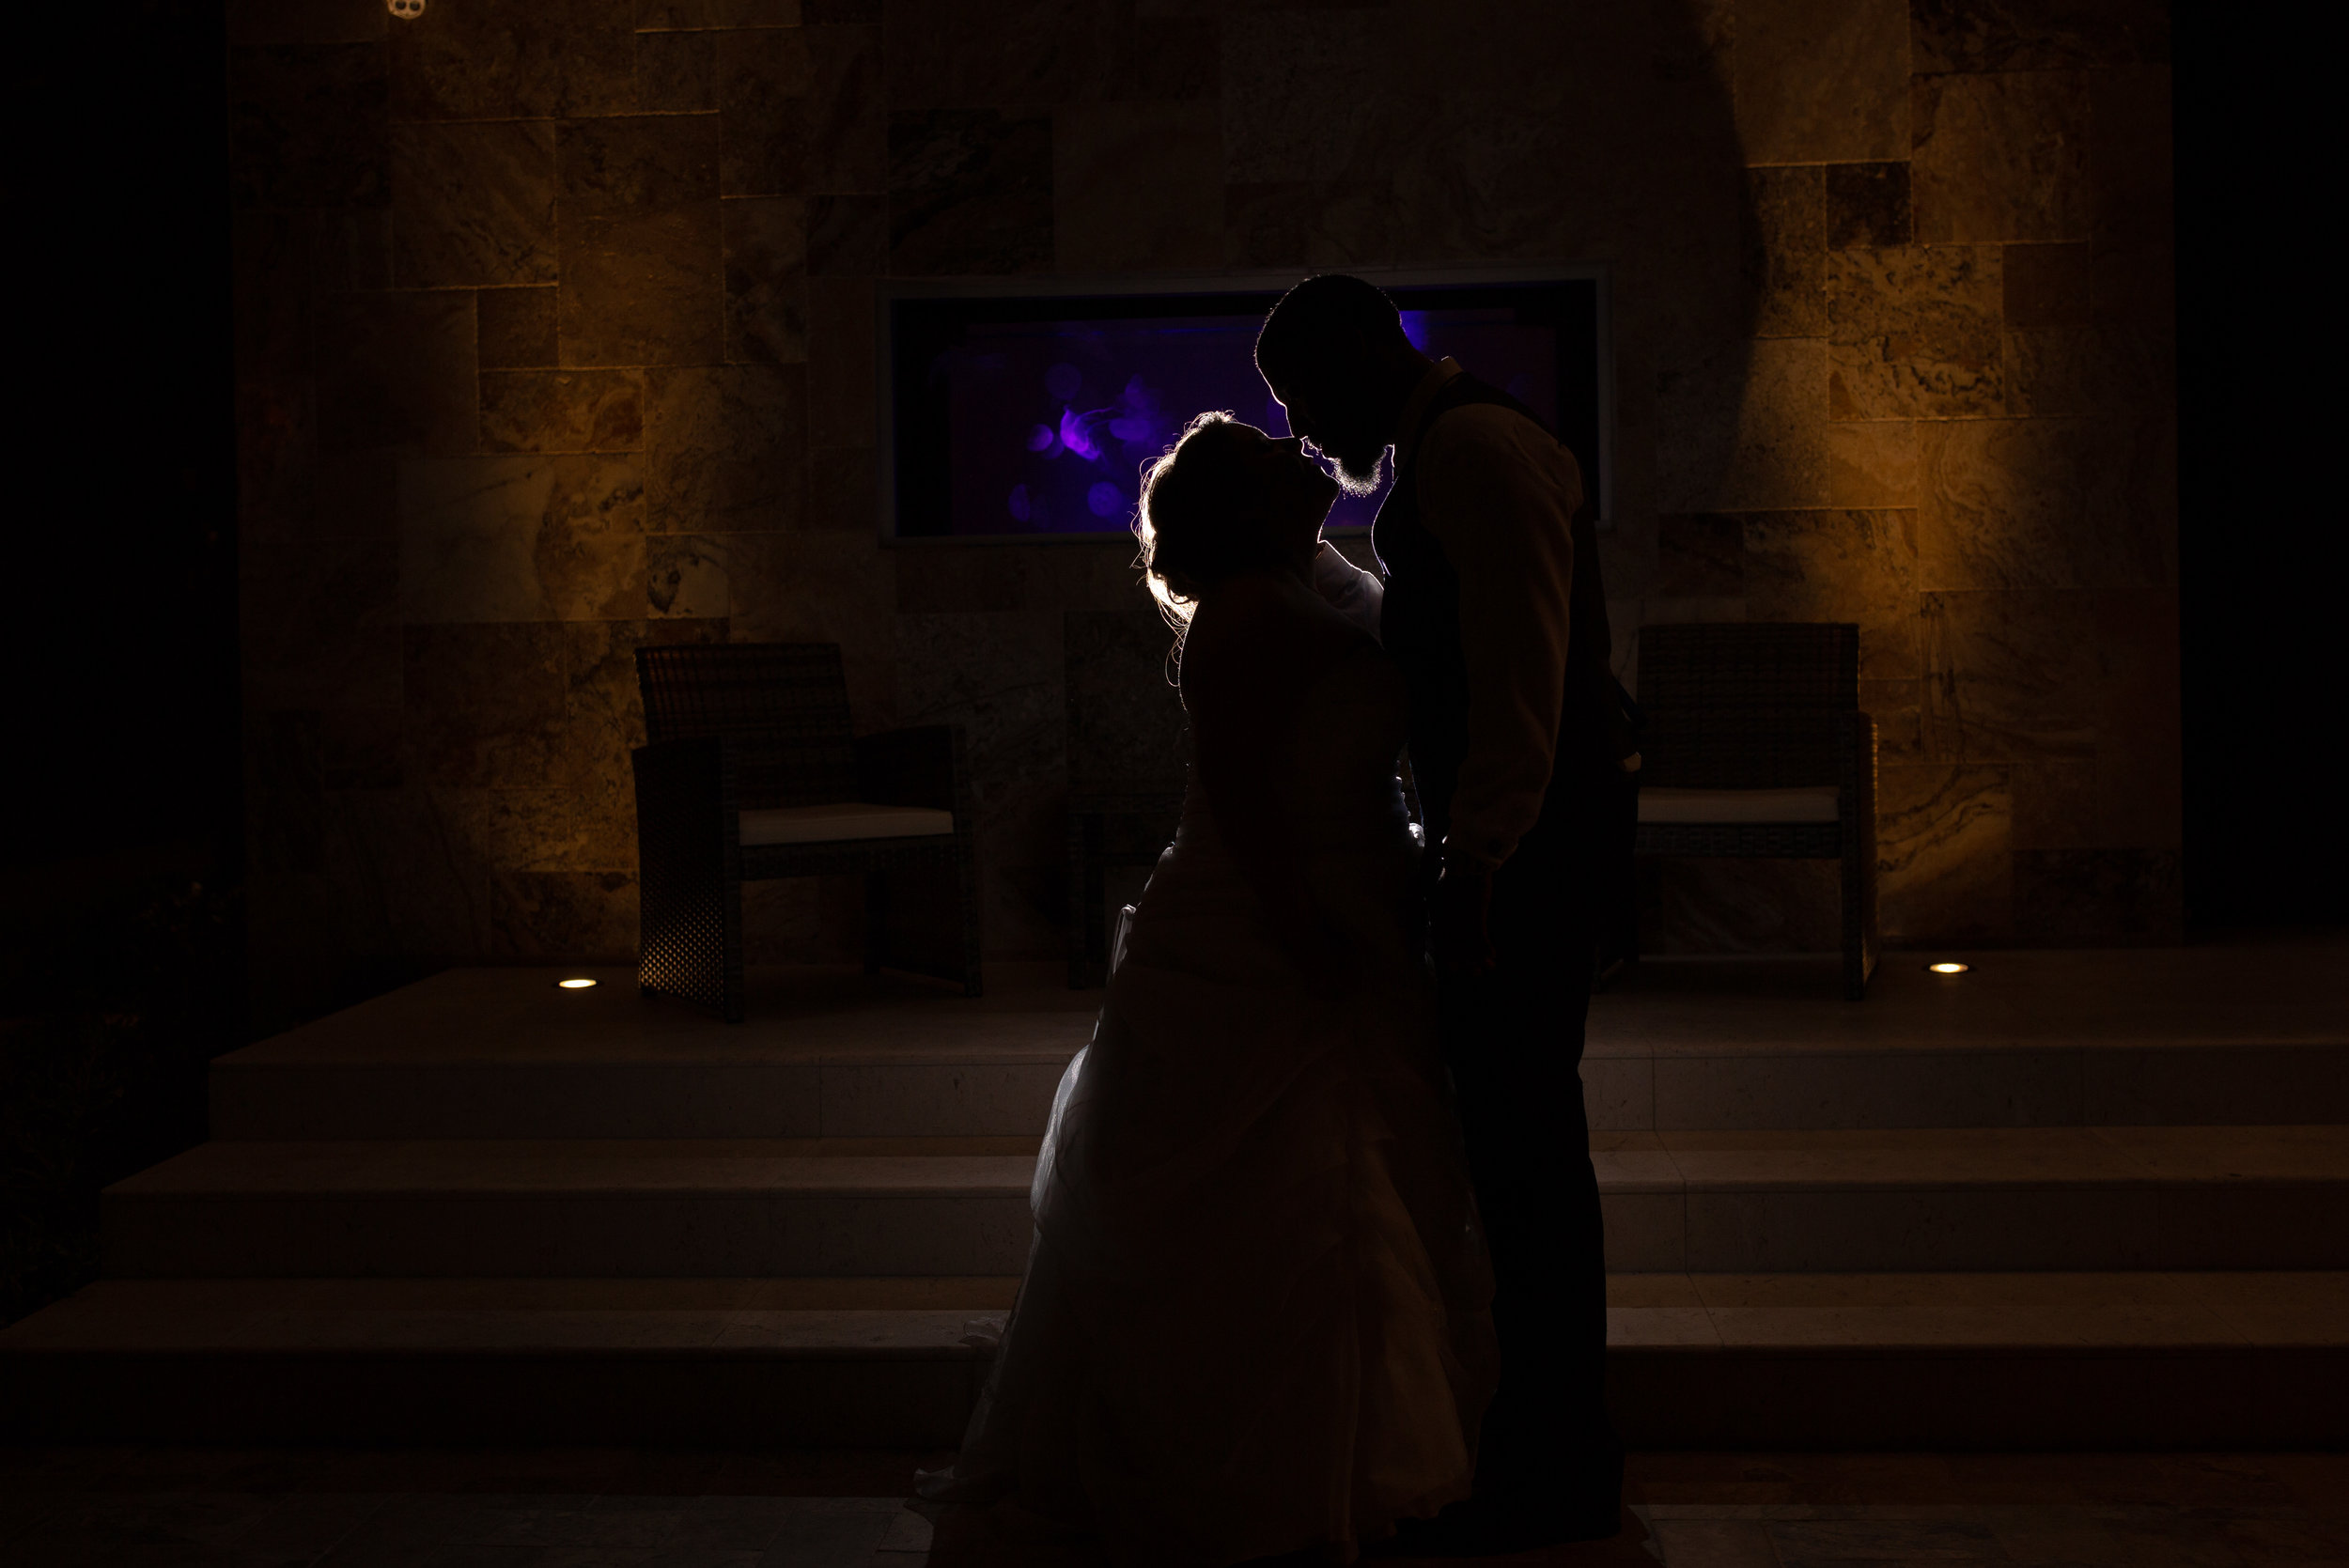 night-wedding-portrait-tiny-house-photo-hollywood-weddings-elopements.jpg.jpg